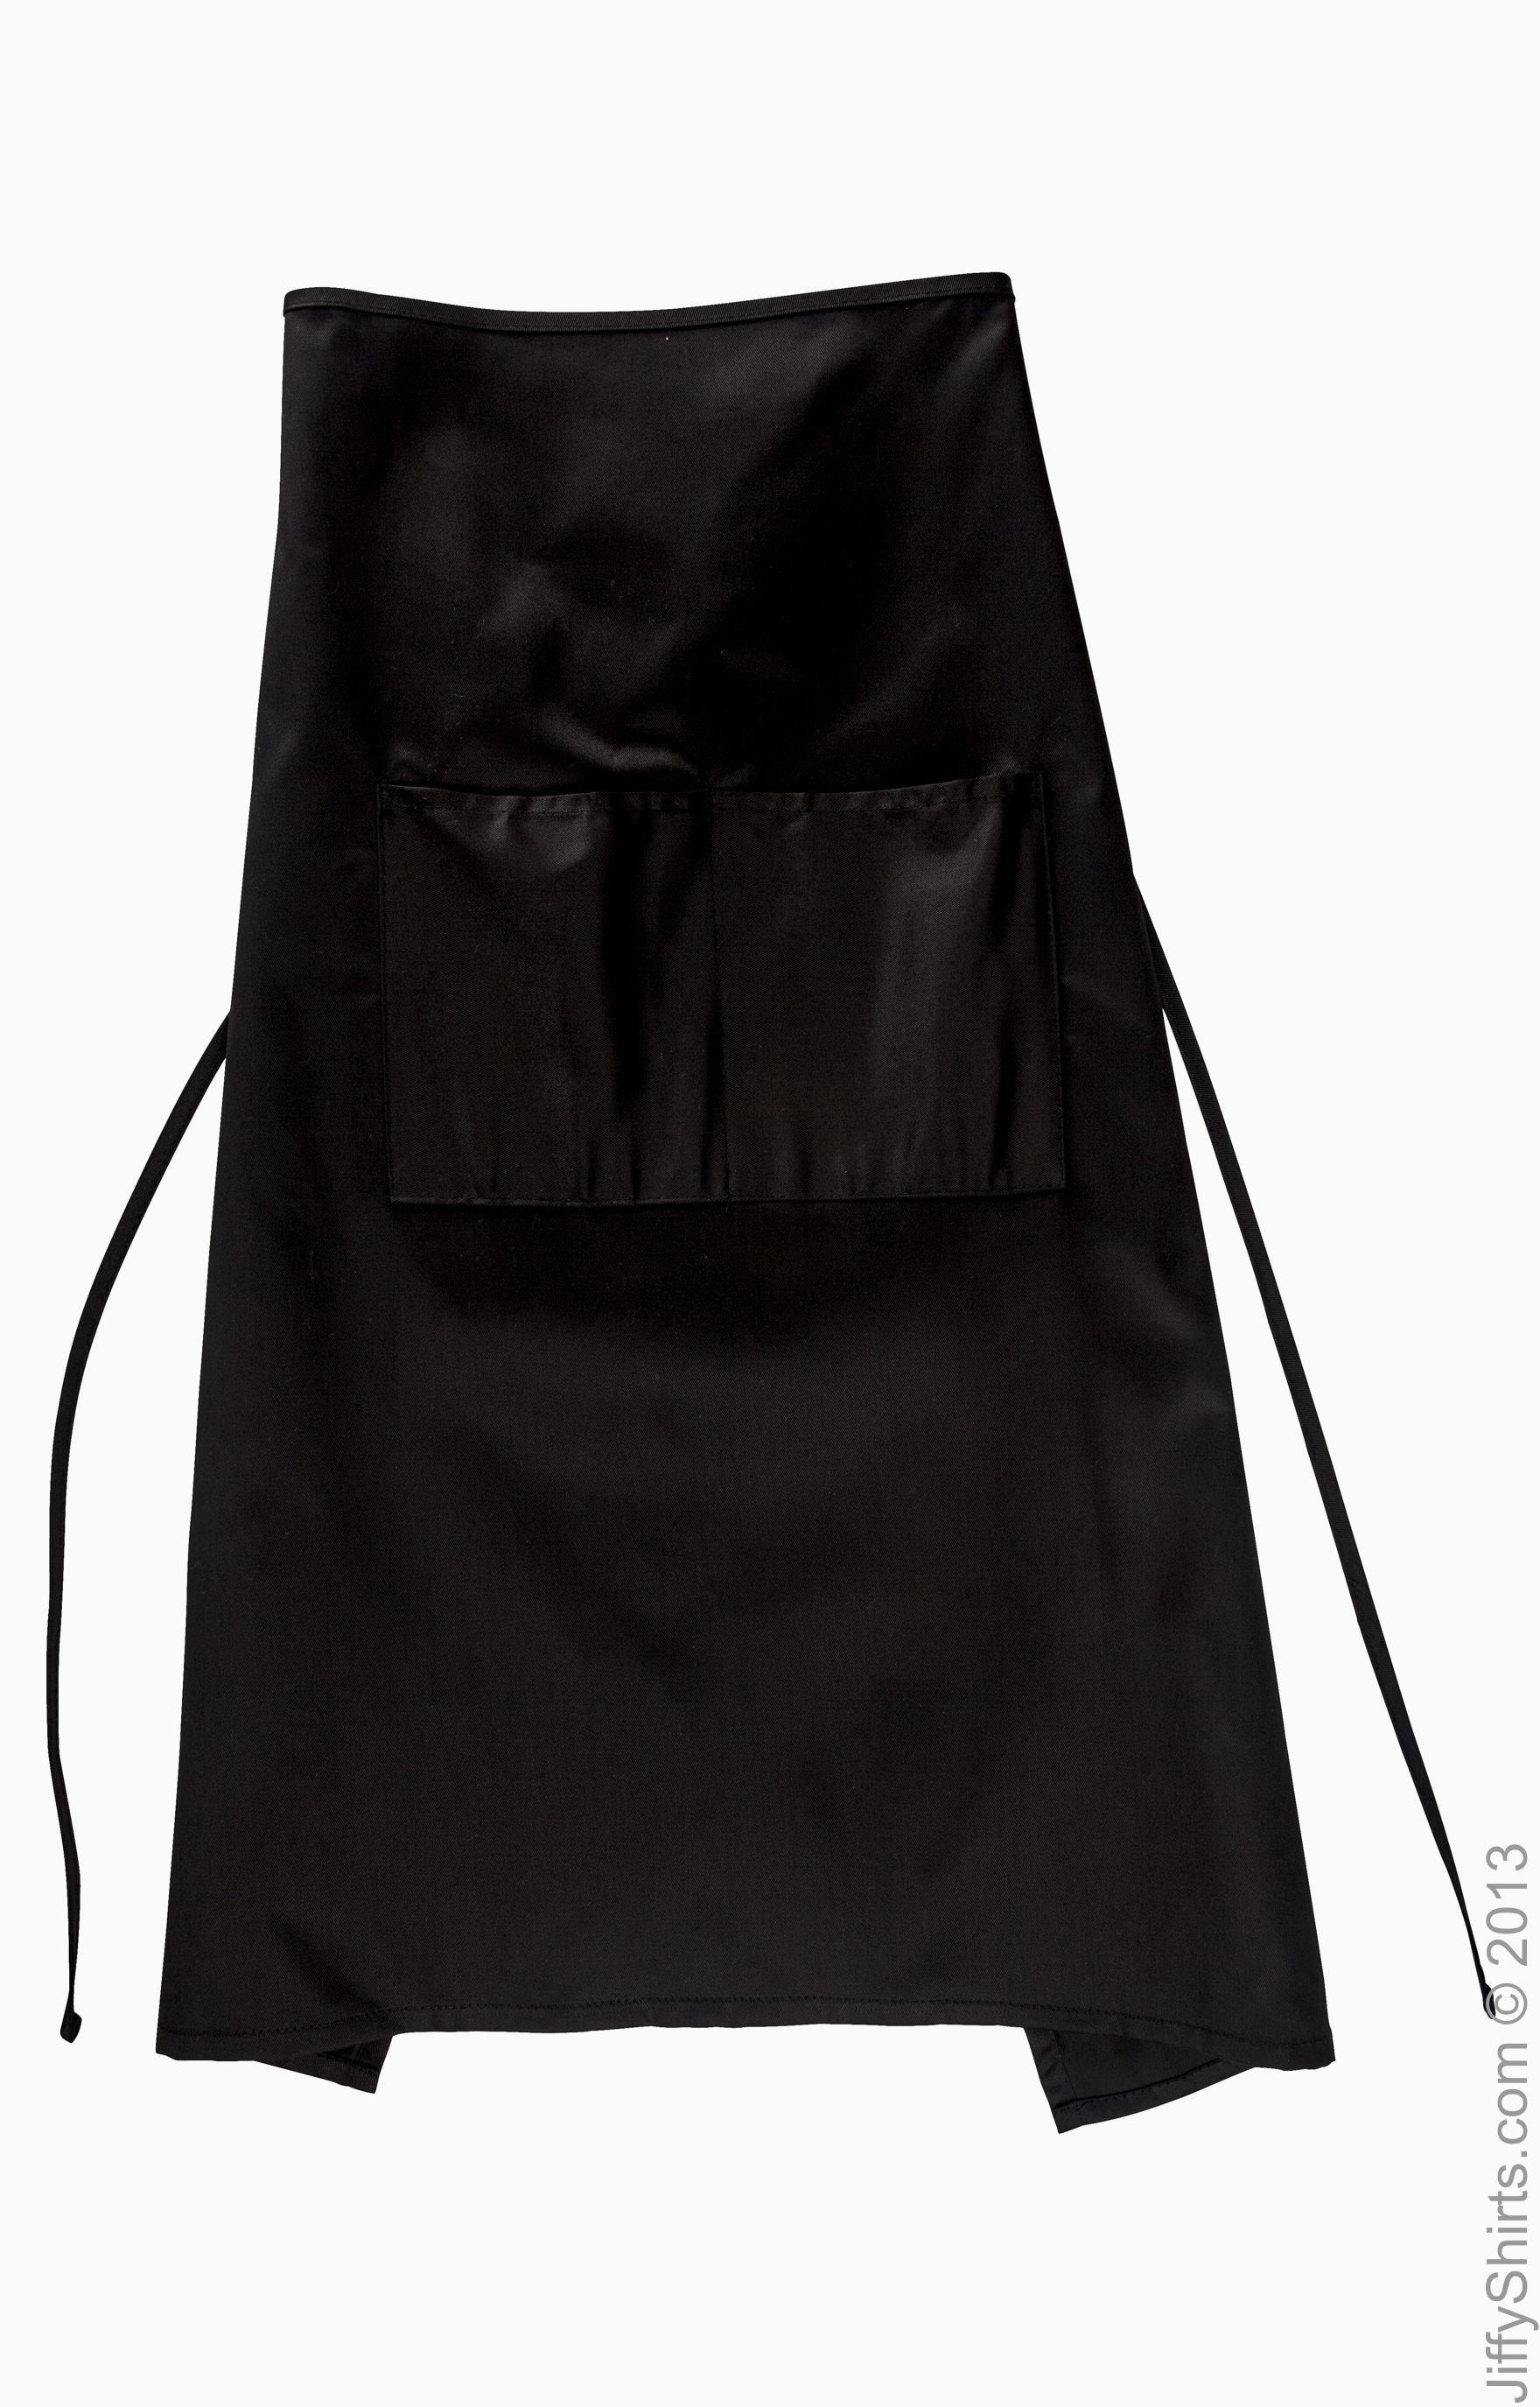 Big Accessories APR55 Black